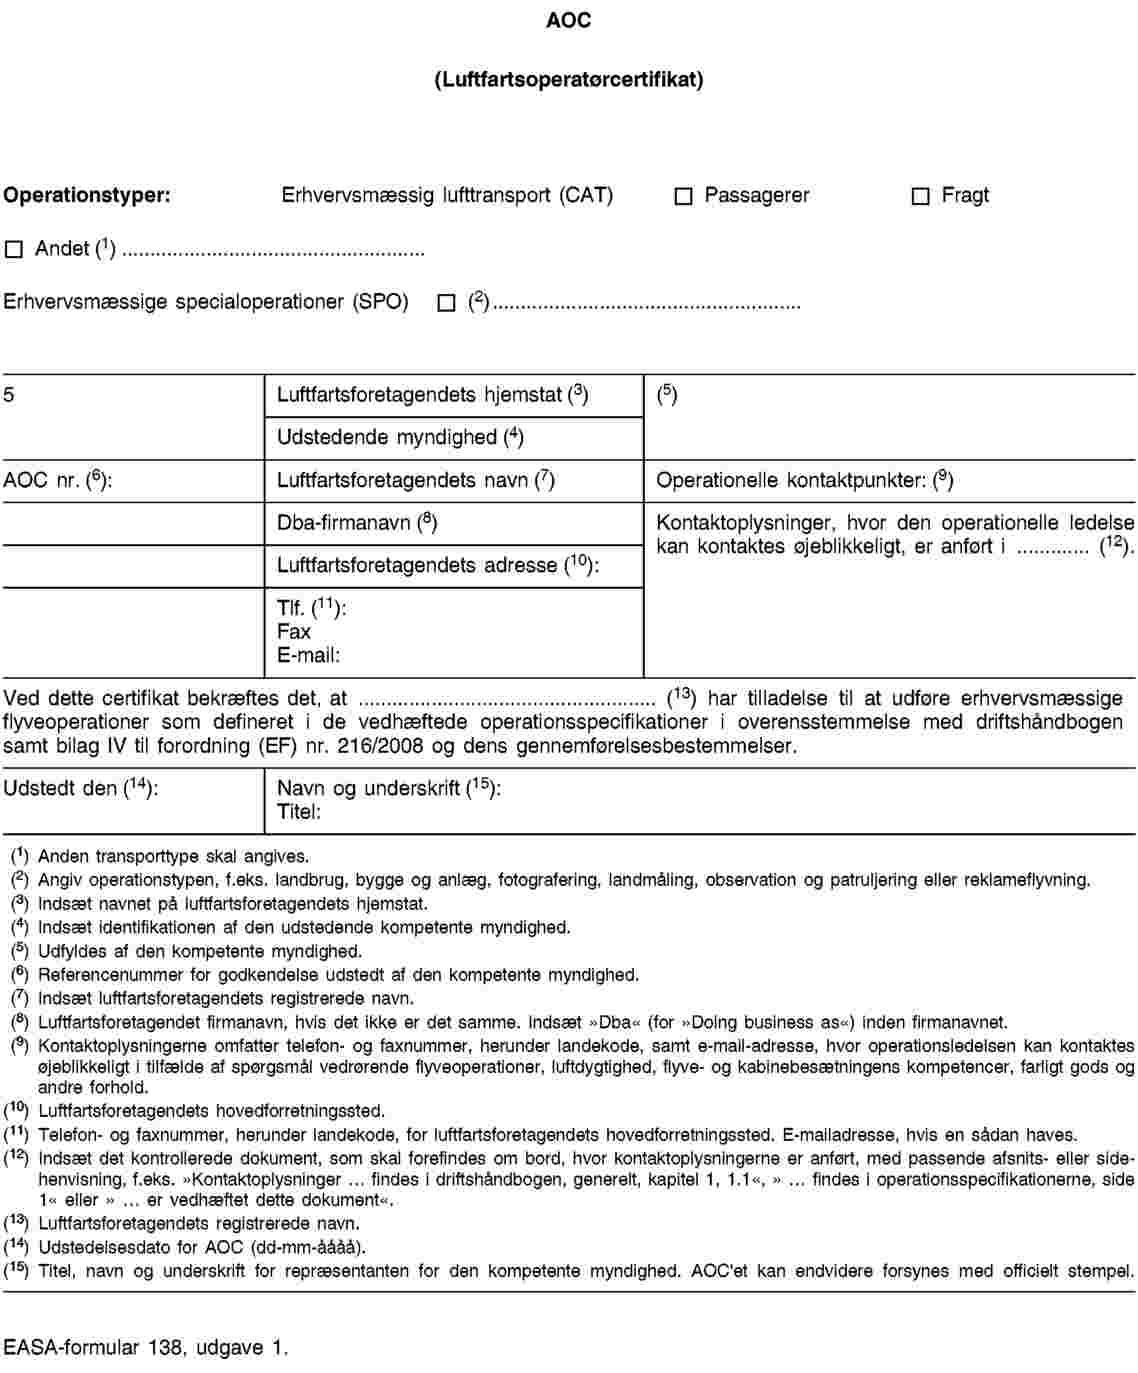 EUR-Lex - 32012R0965 - EN - EUR-Lex